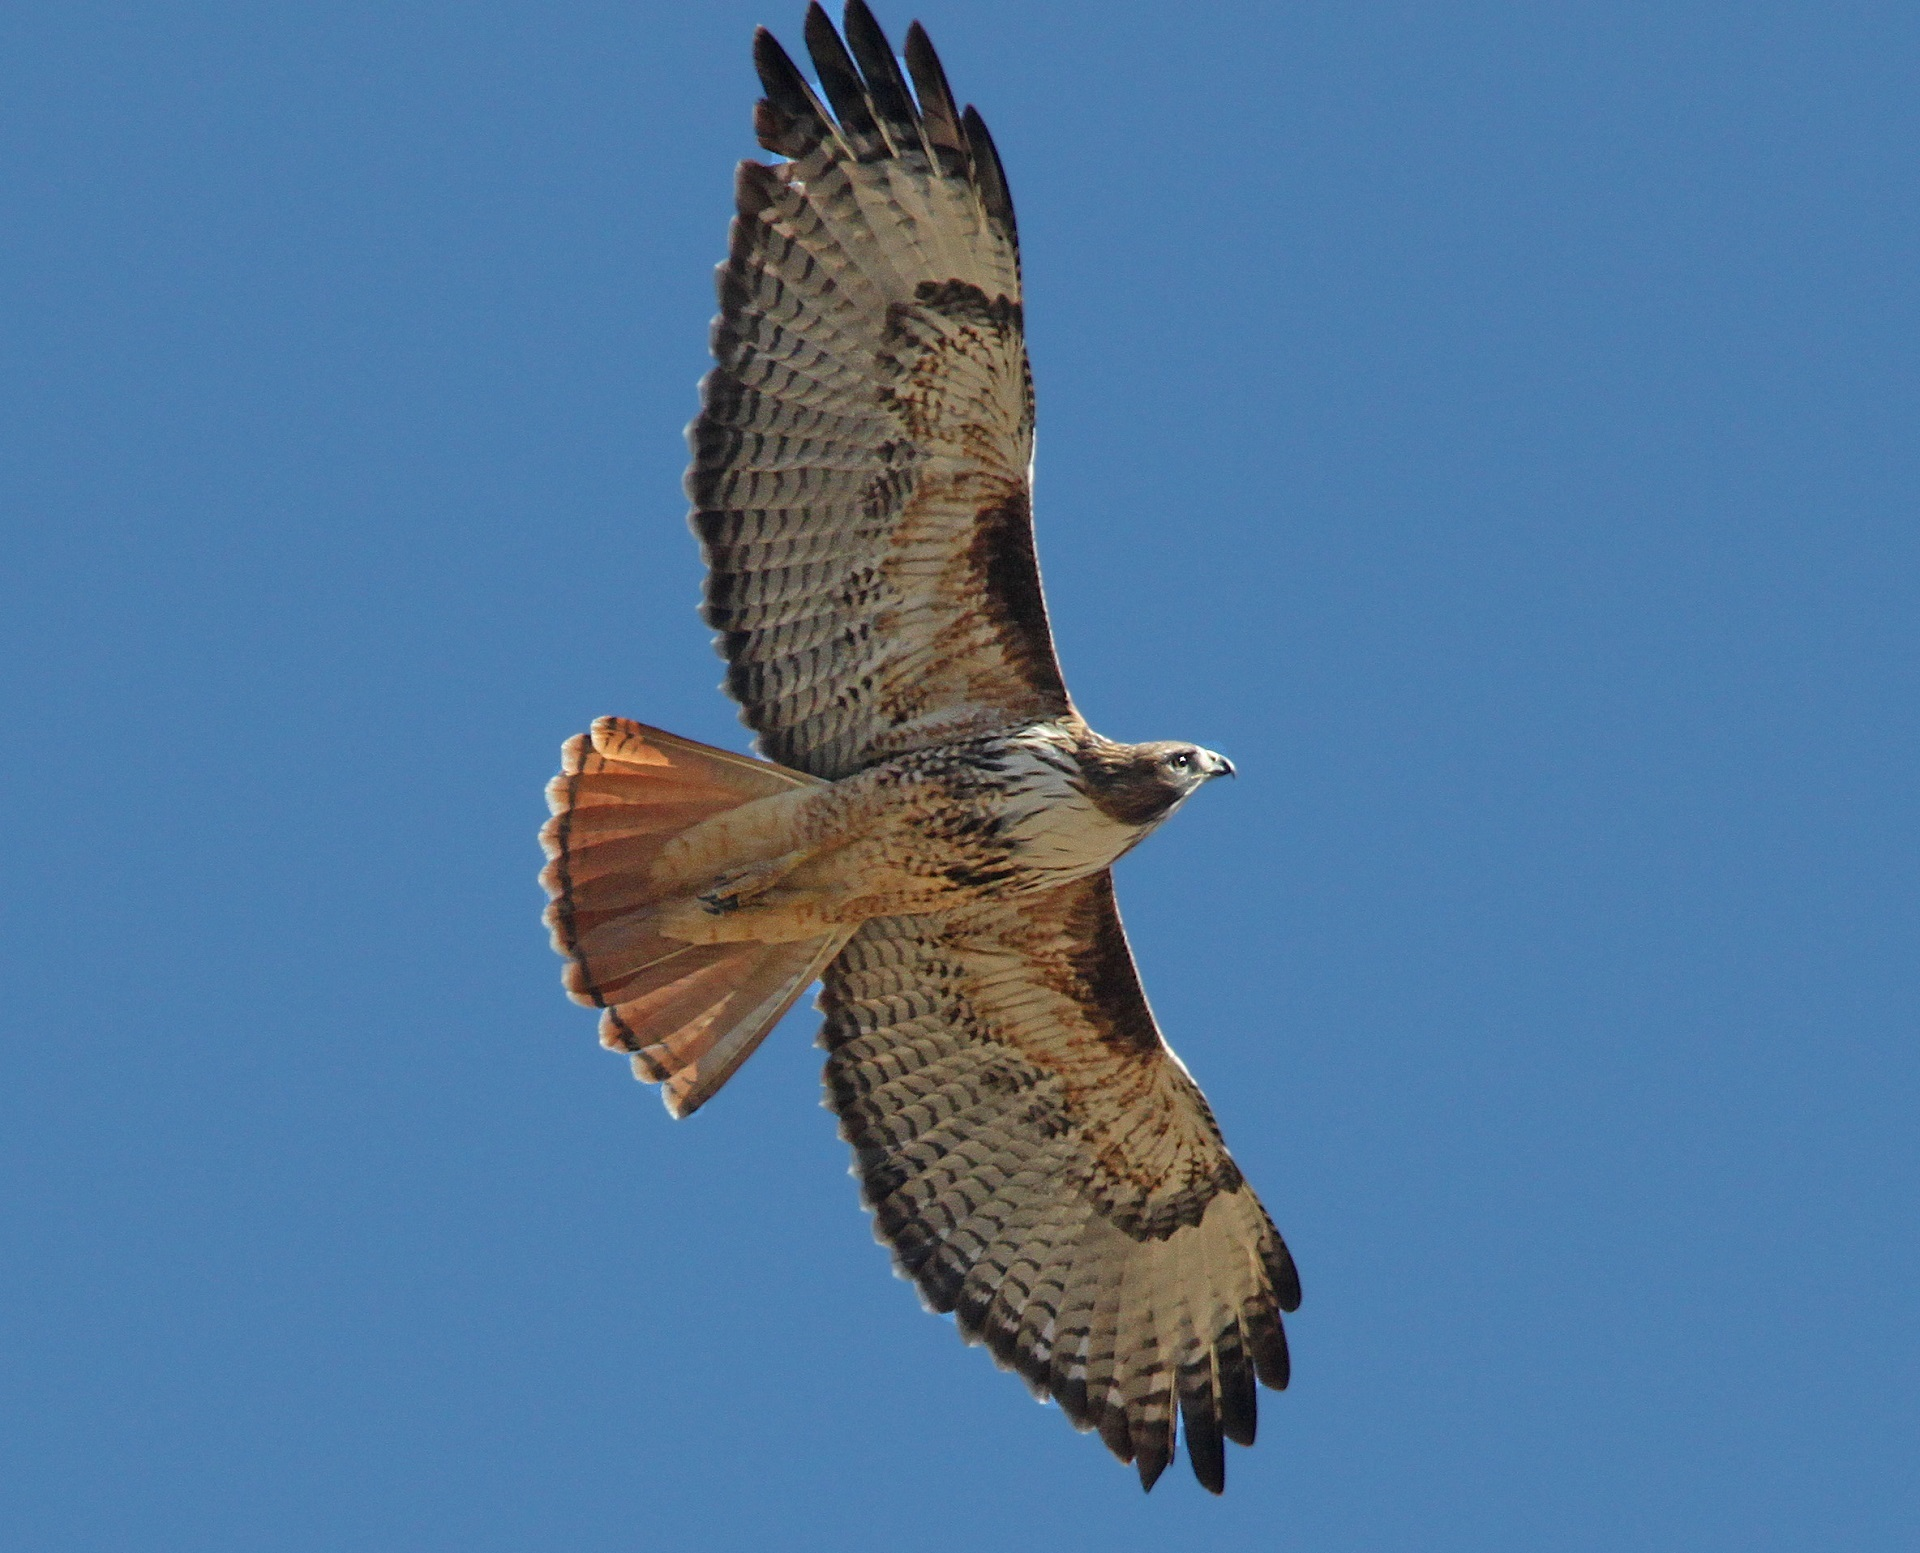 red-tailed-hawk-1712098.jpg